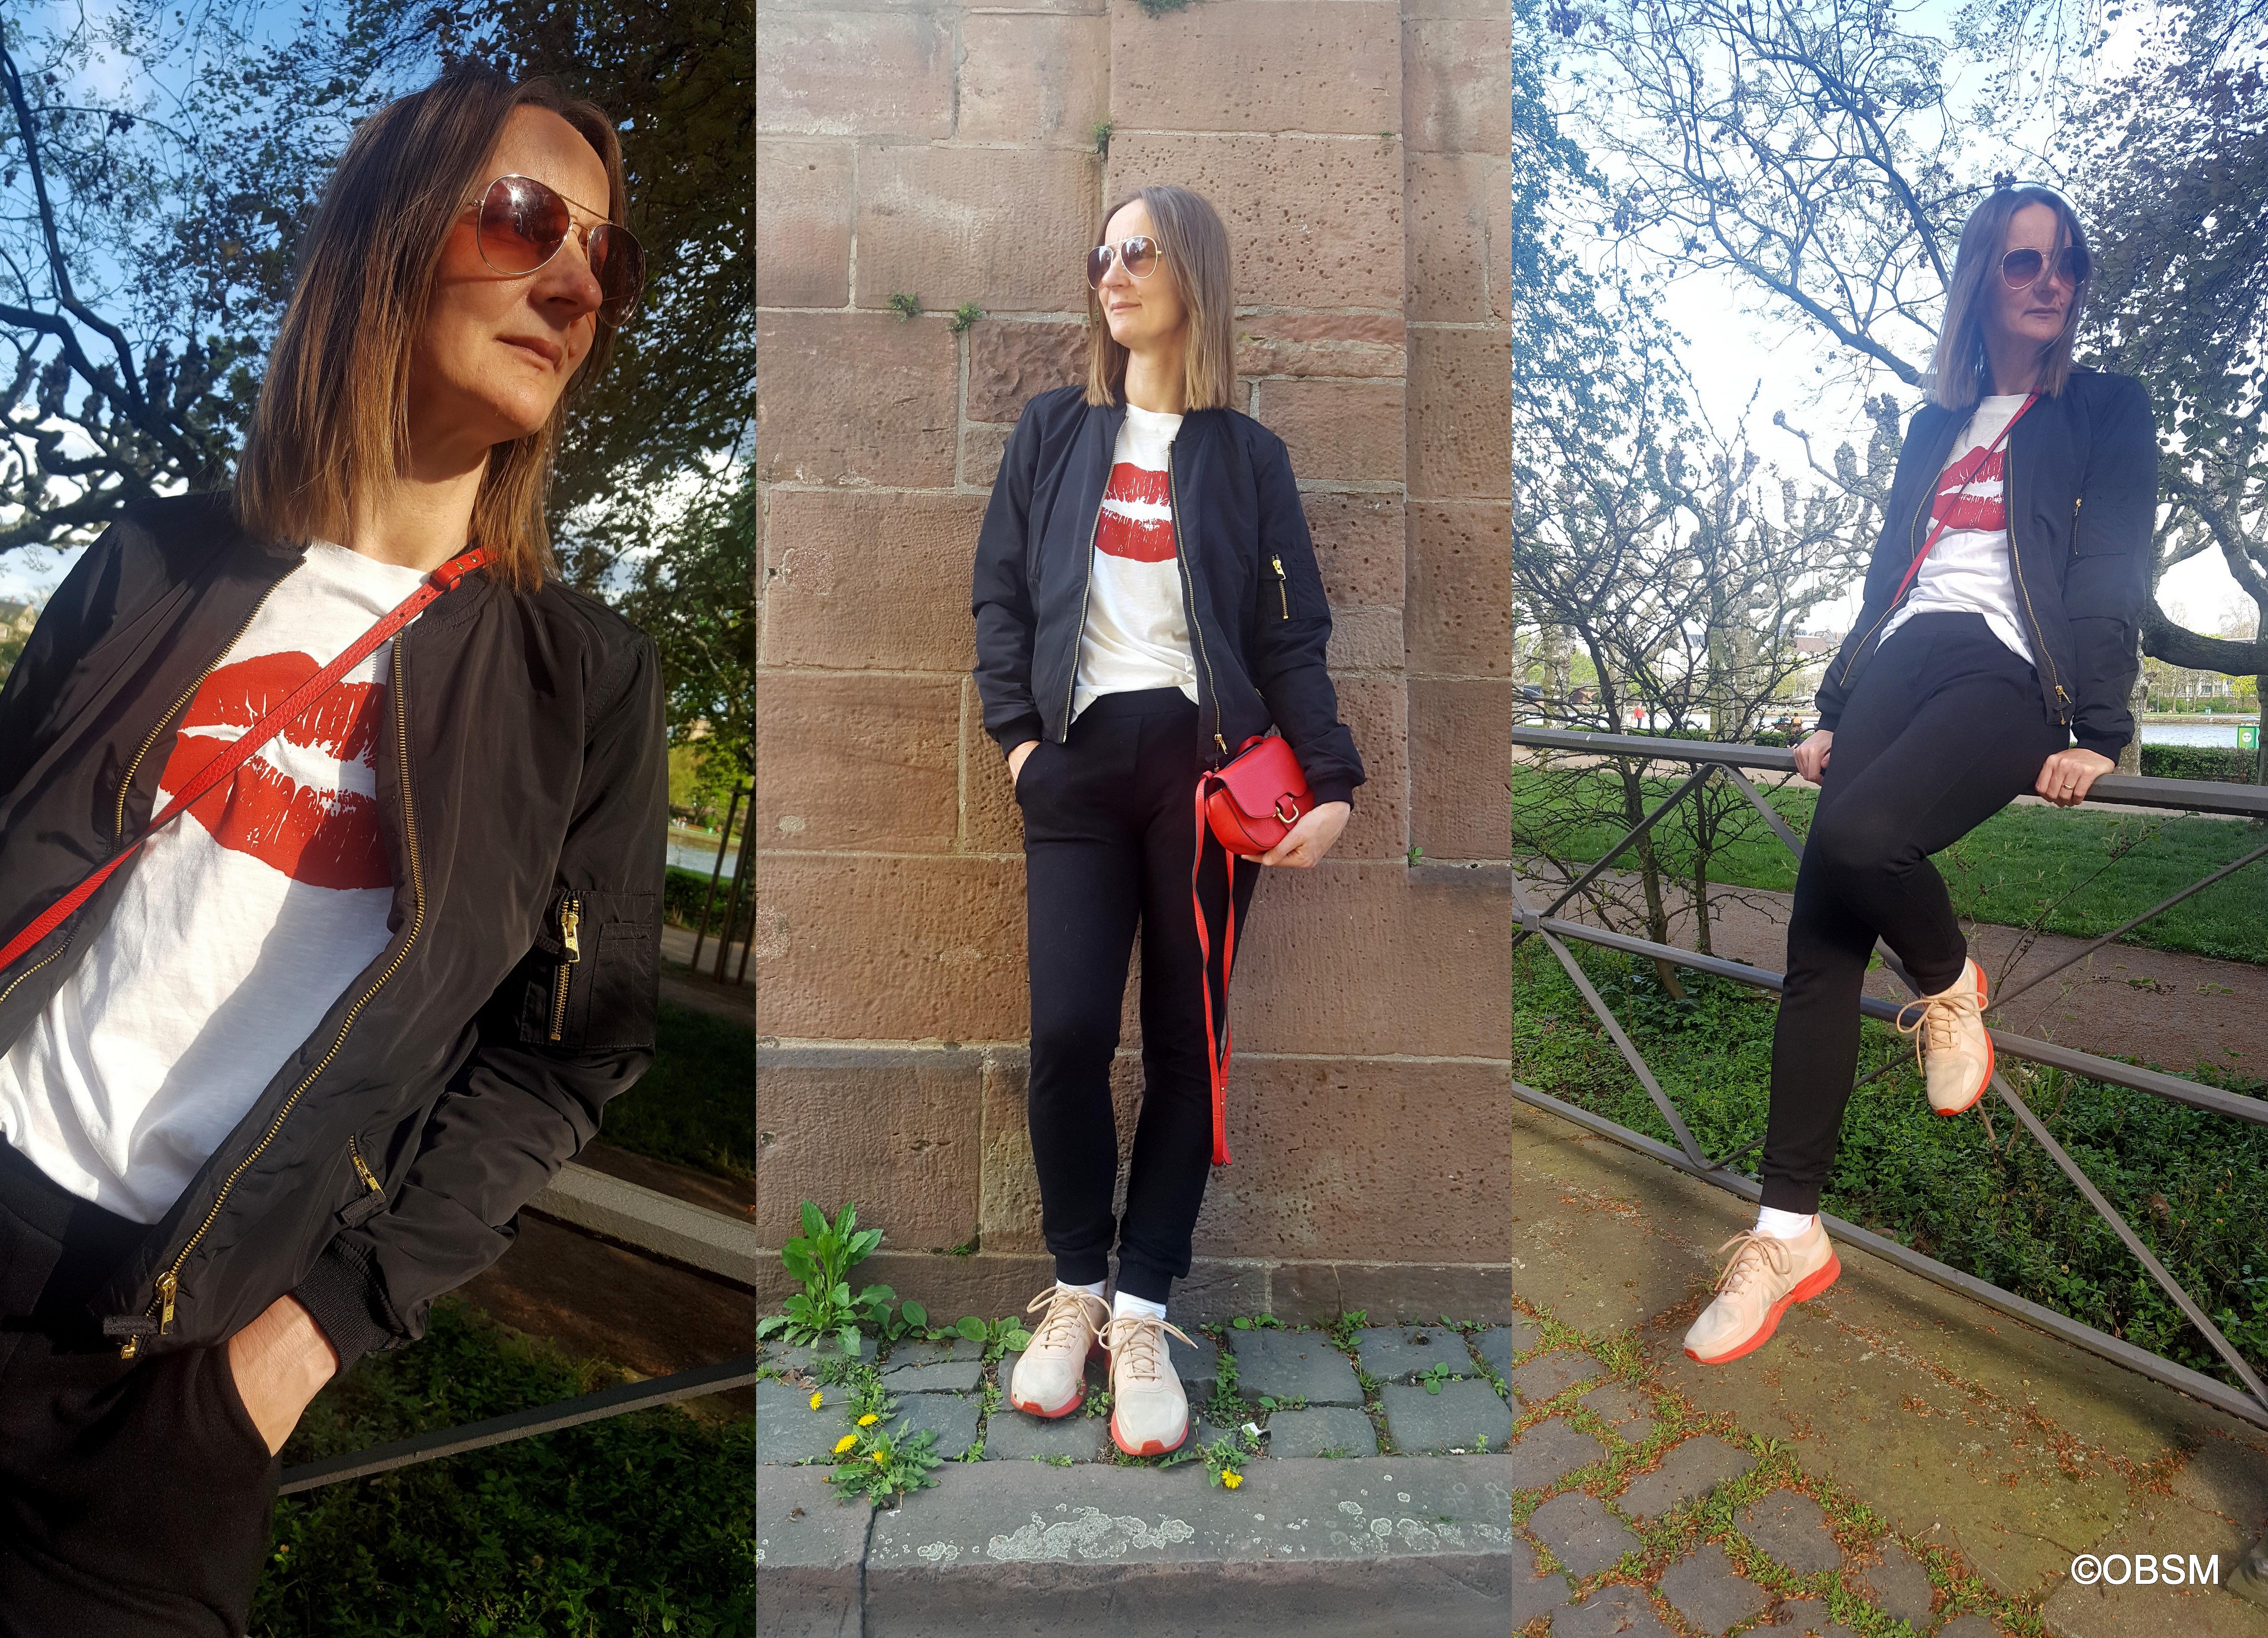 oceanblue-style_blouson_jogging-hose_rote_tasche_sneakers_athleisure_ü40-mode_ue40_blog_t-shirt